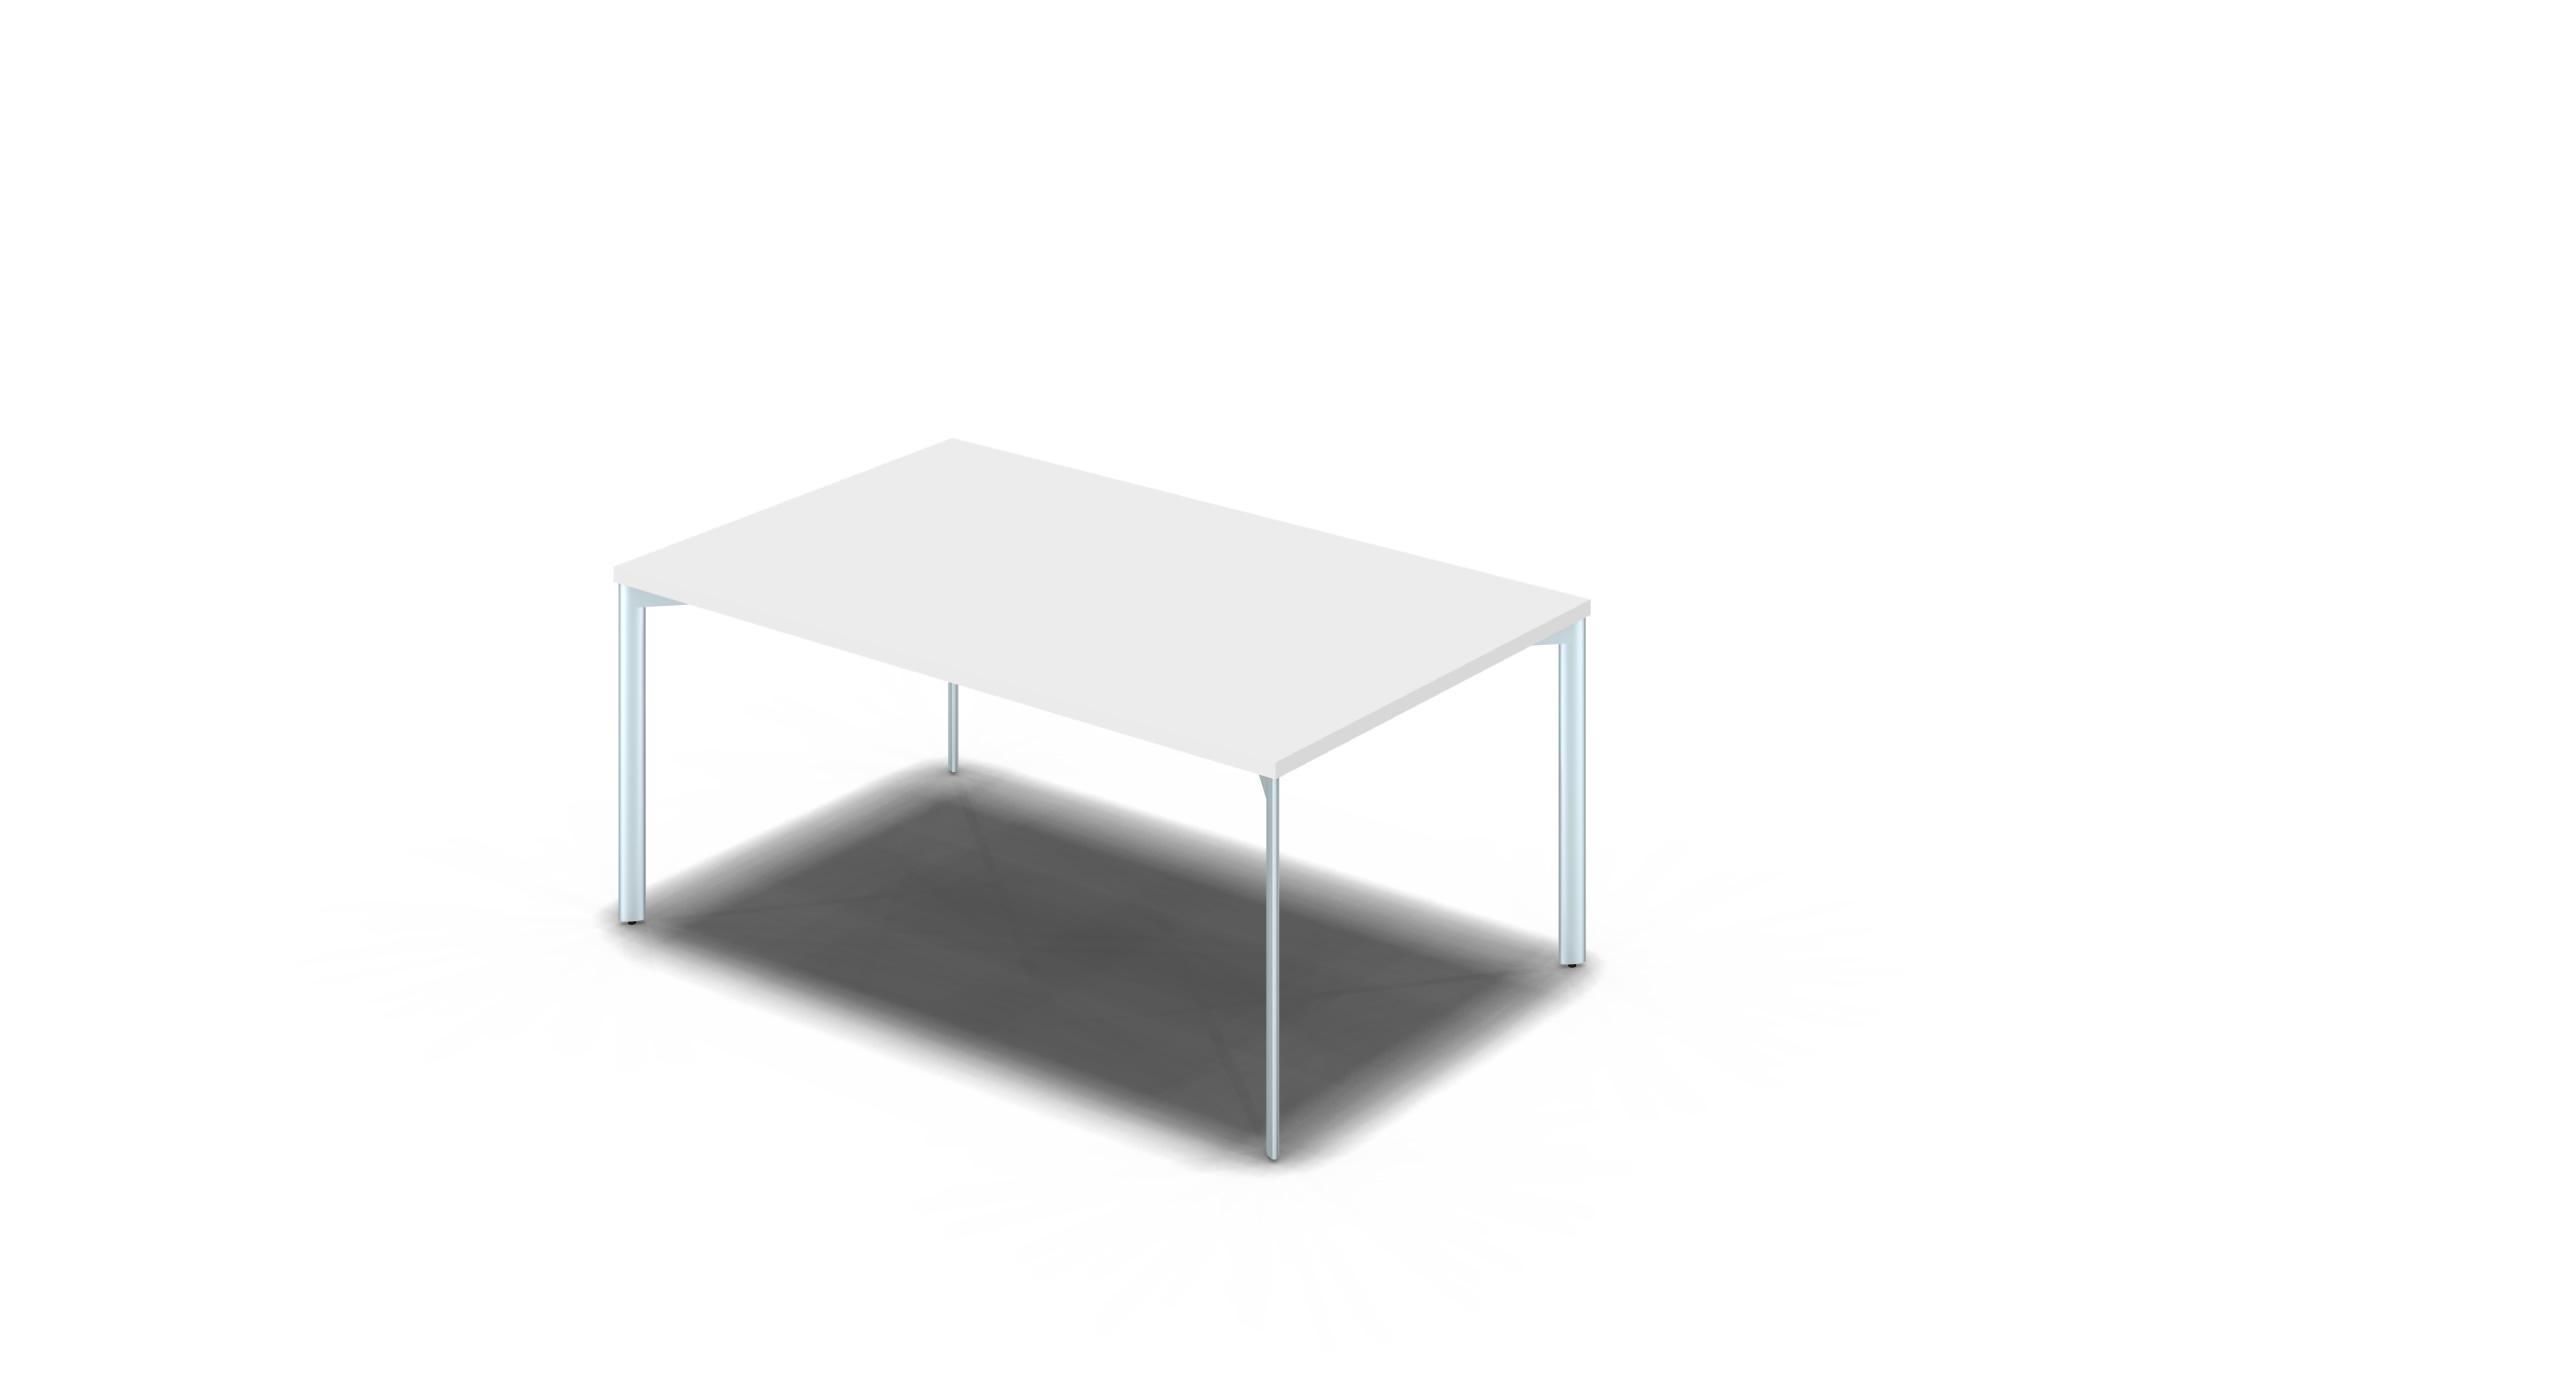 Table_Slim_1500x900_Silver_White_noOption